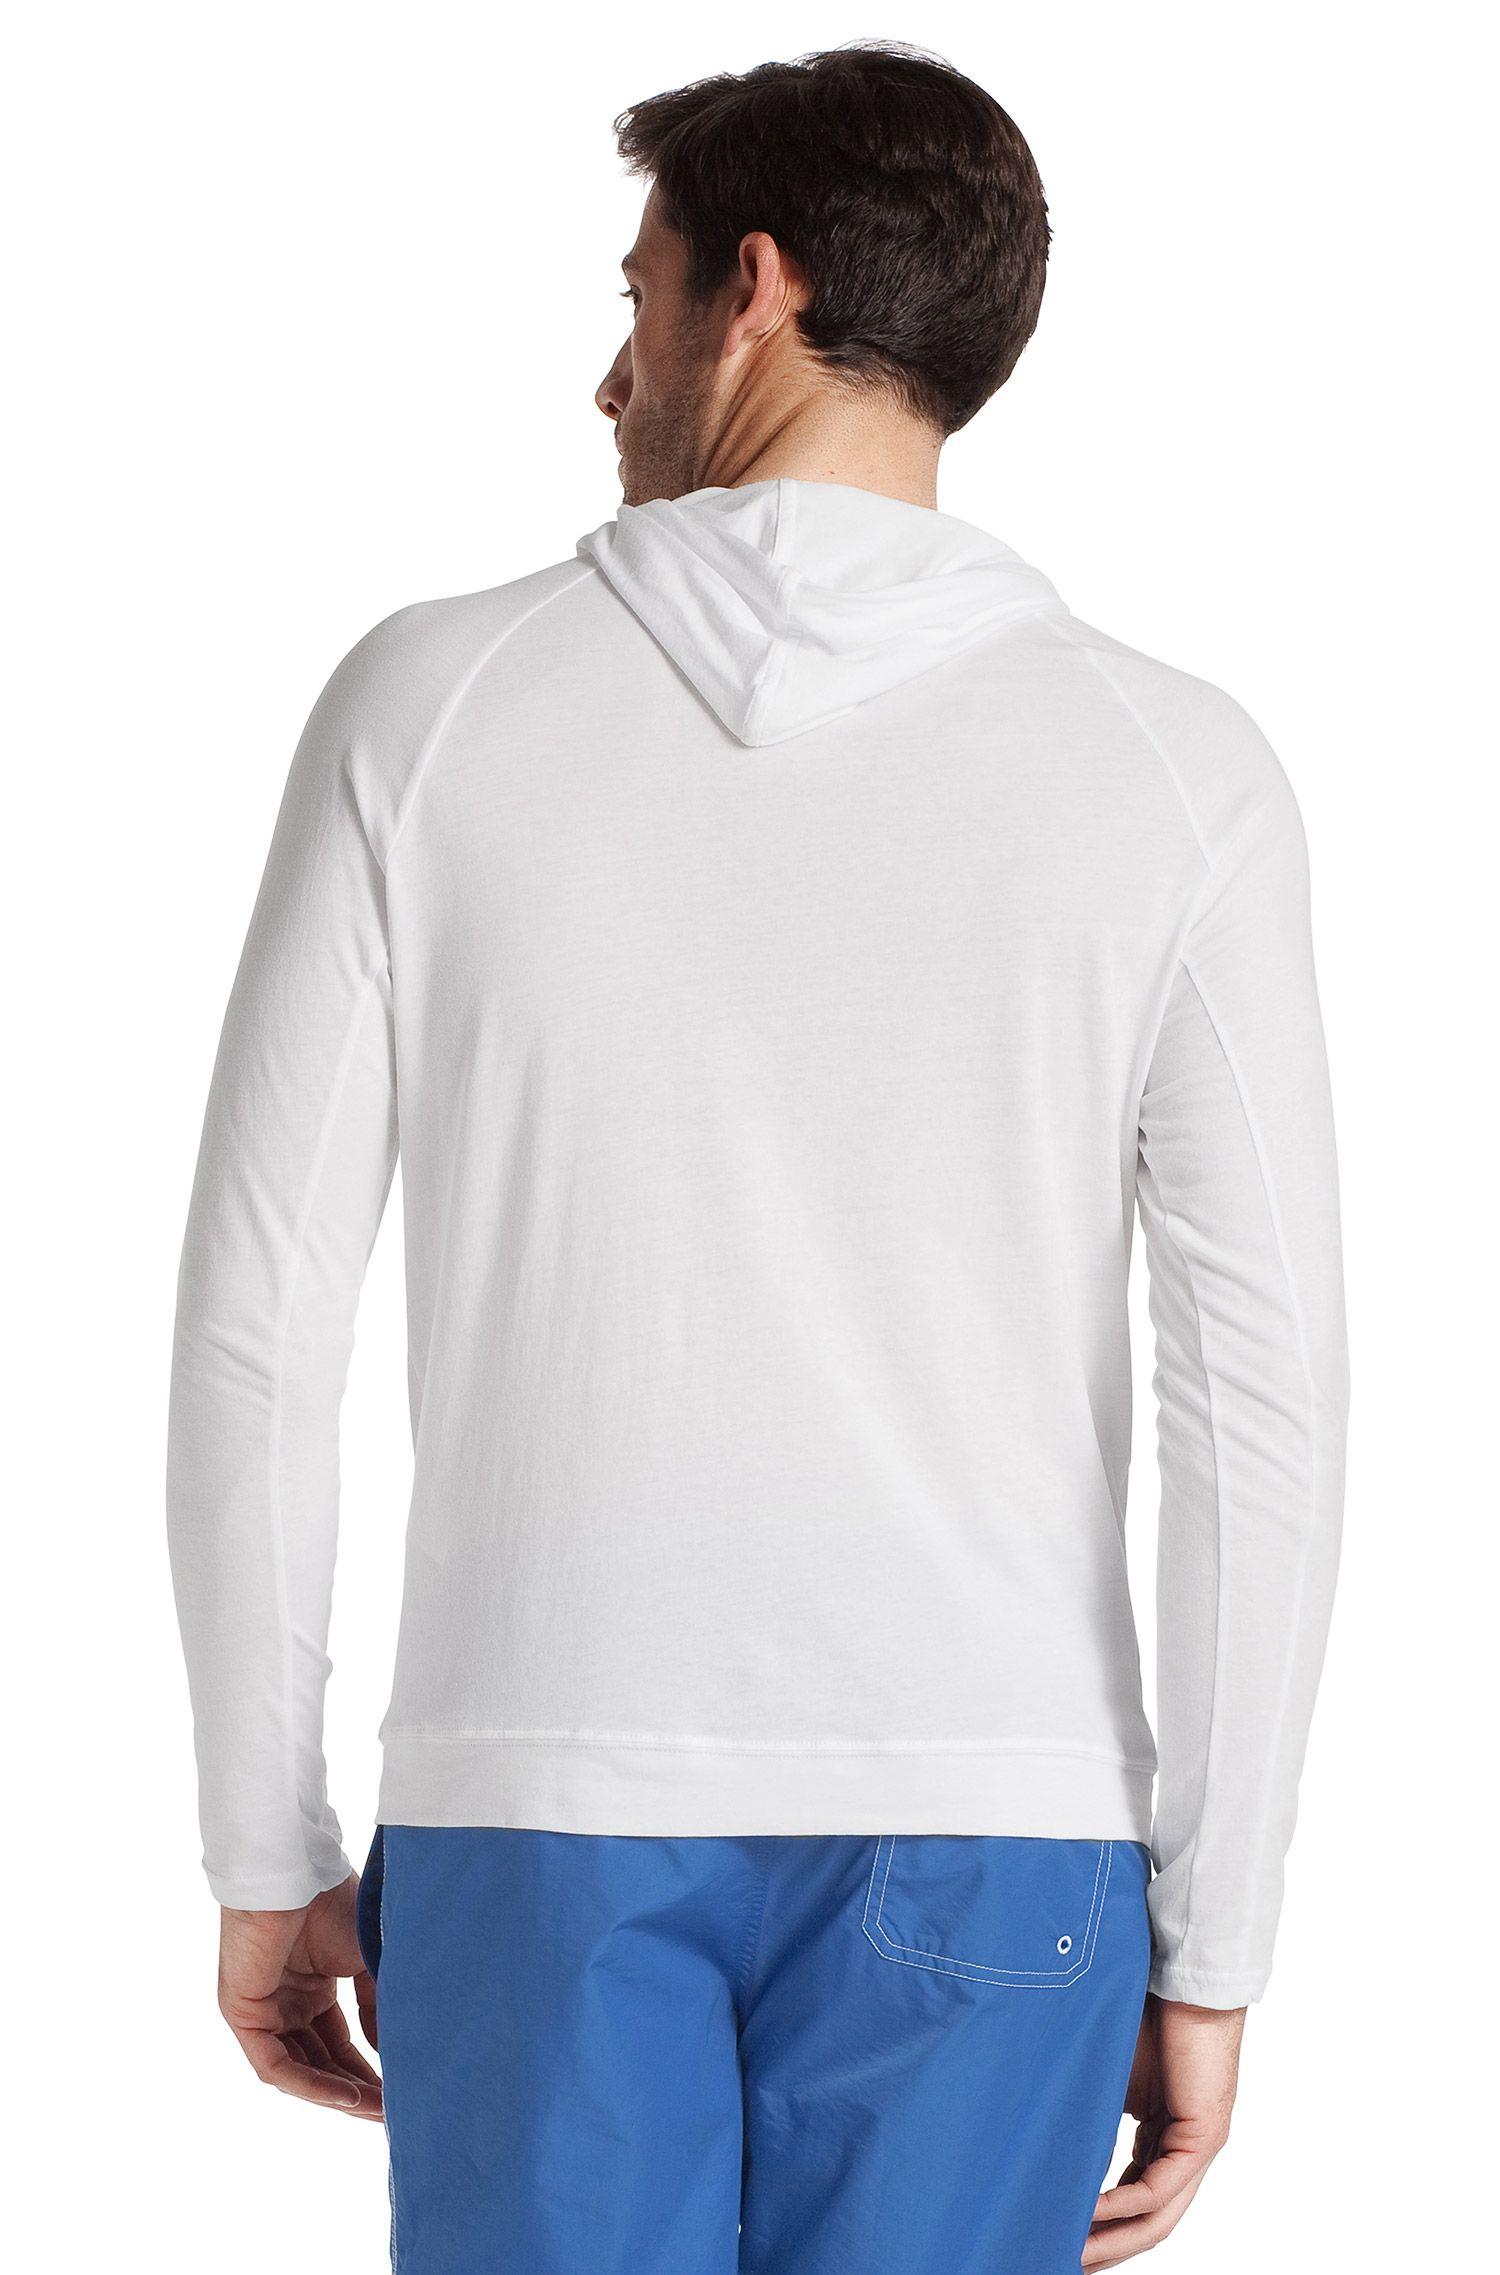 Sweat-shirt à capuche, Shirt Hoodes LS BM